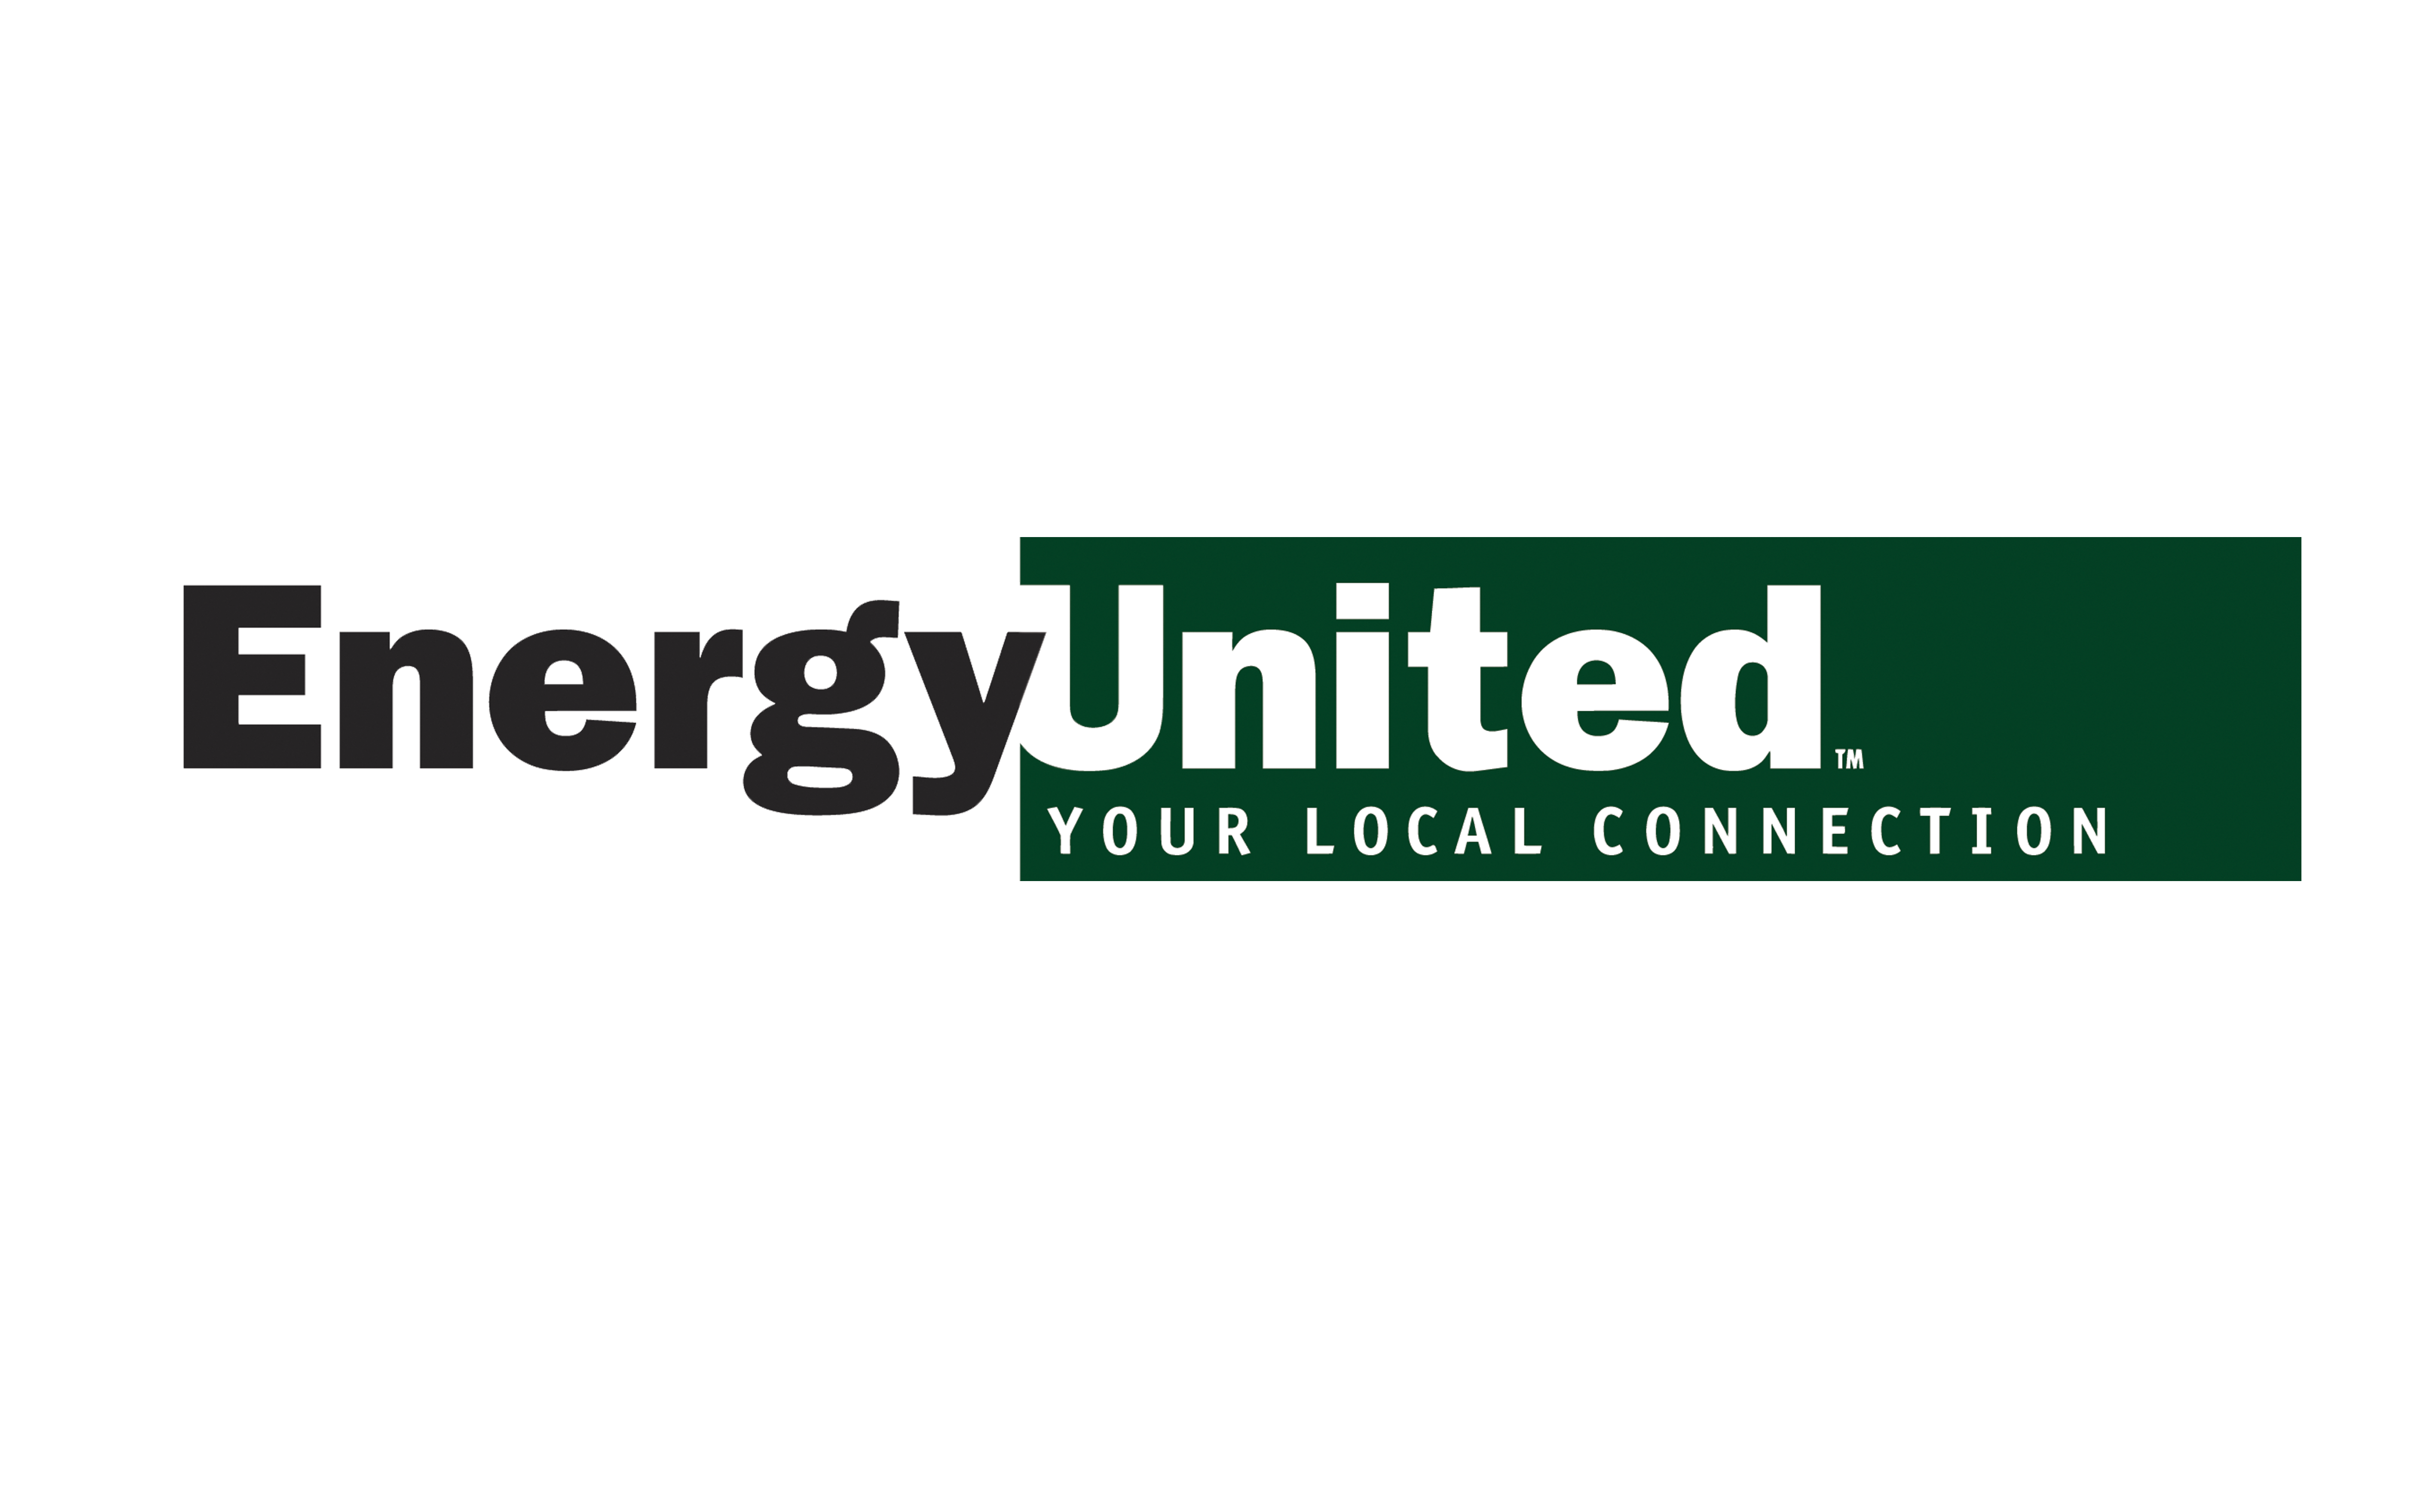 Energy United